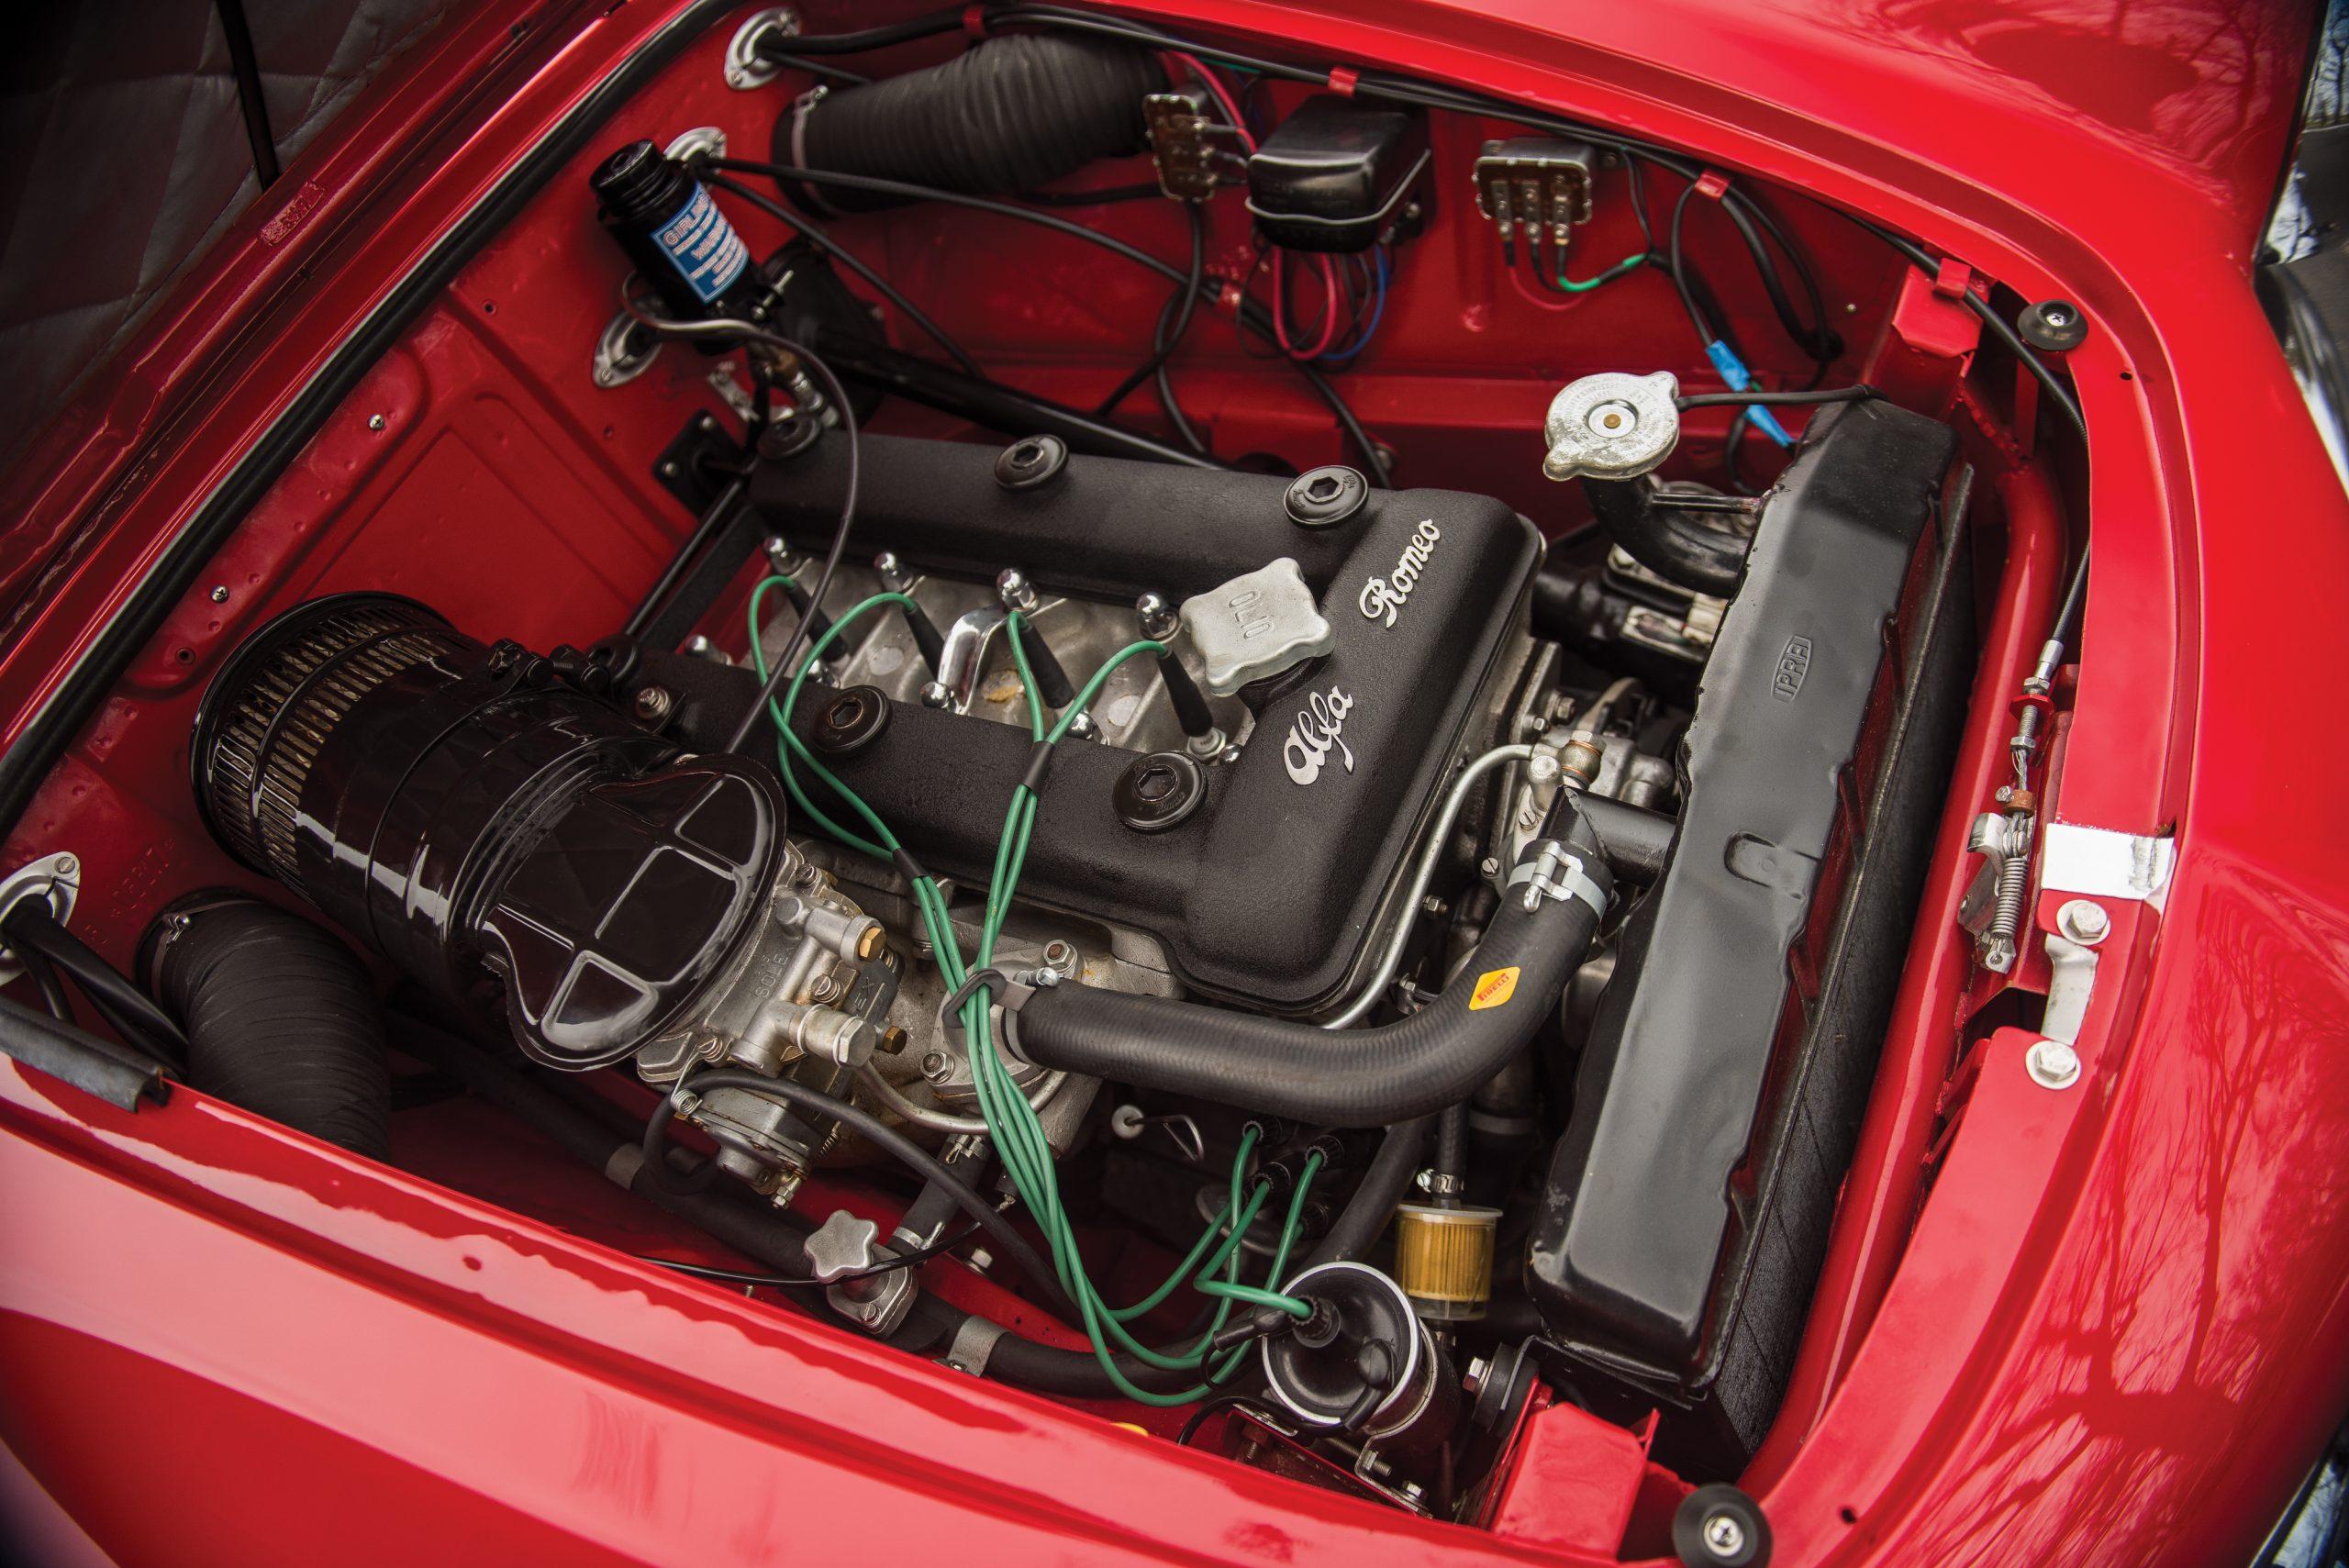 1959 Alfa Romeo Giulietta Spider engine bay